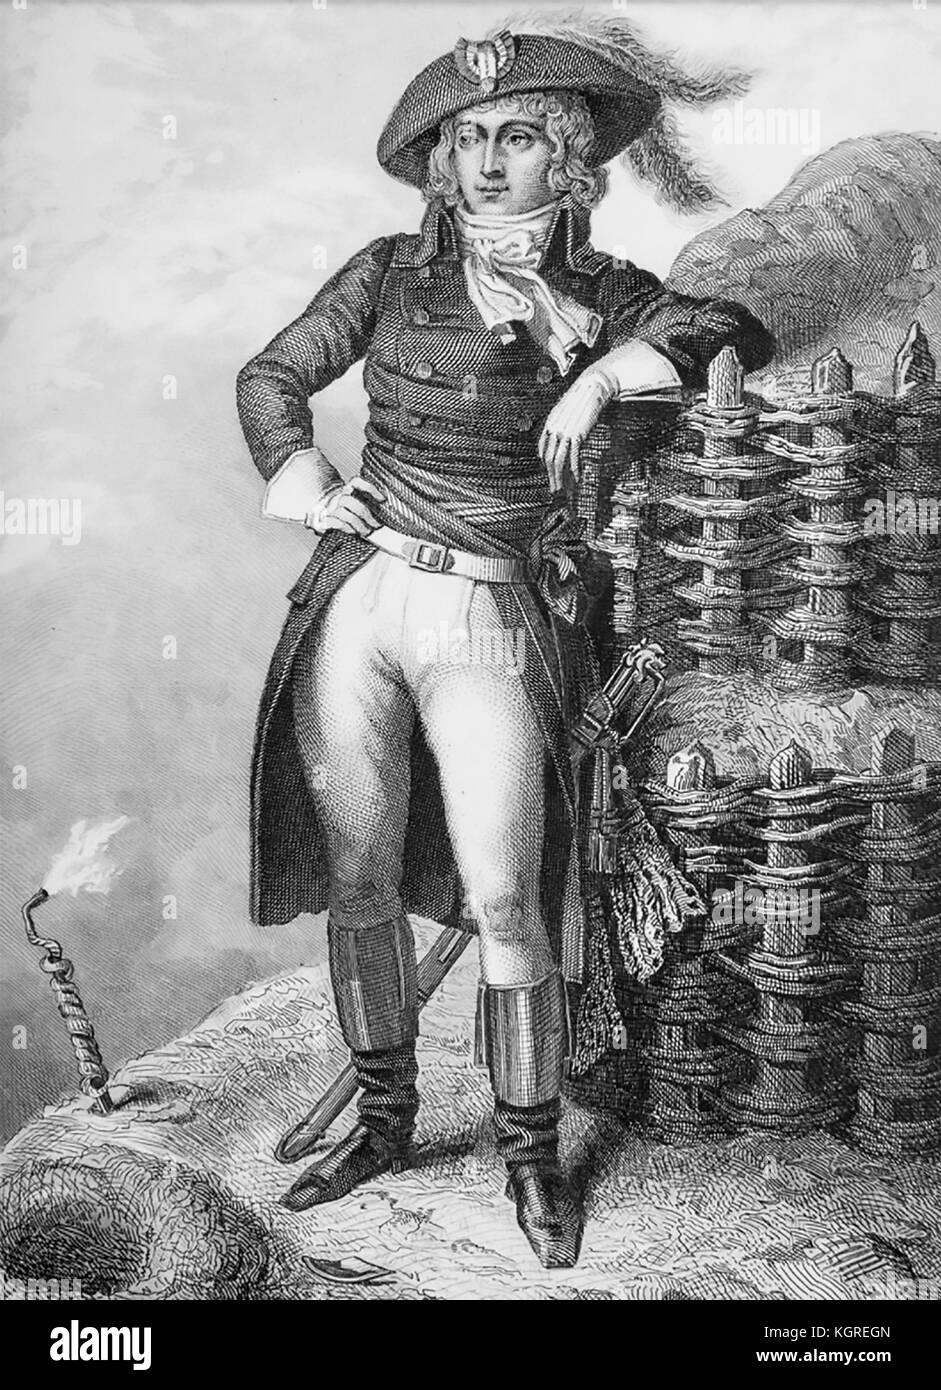 NAPOLEON BONAPARTE (1769-1821) at the Siege of Toulon in 1793 - Stock Image